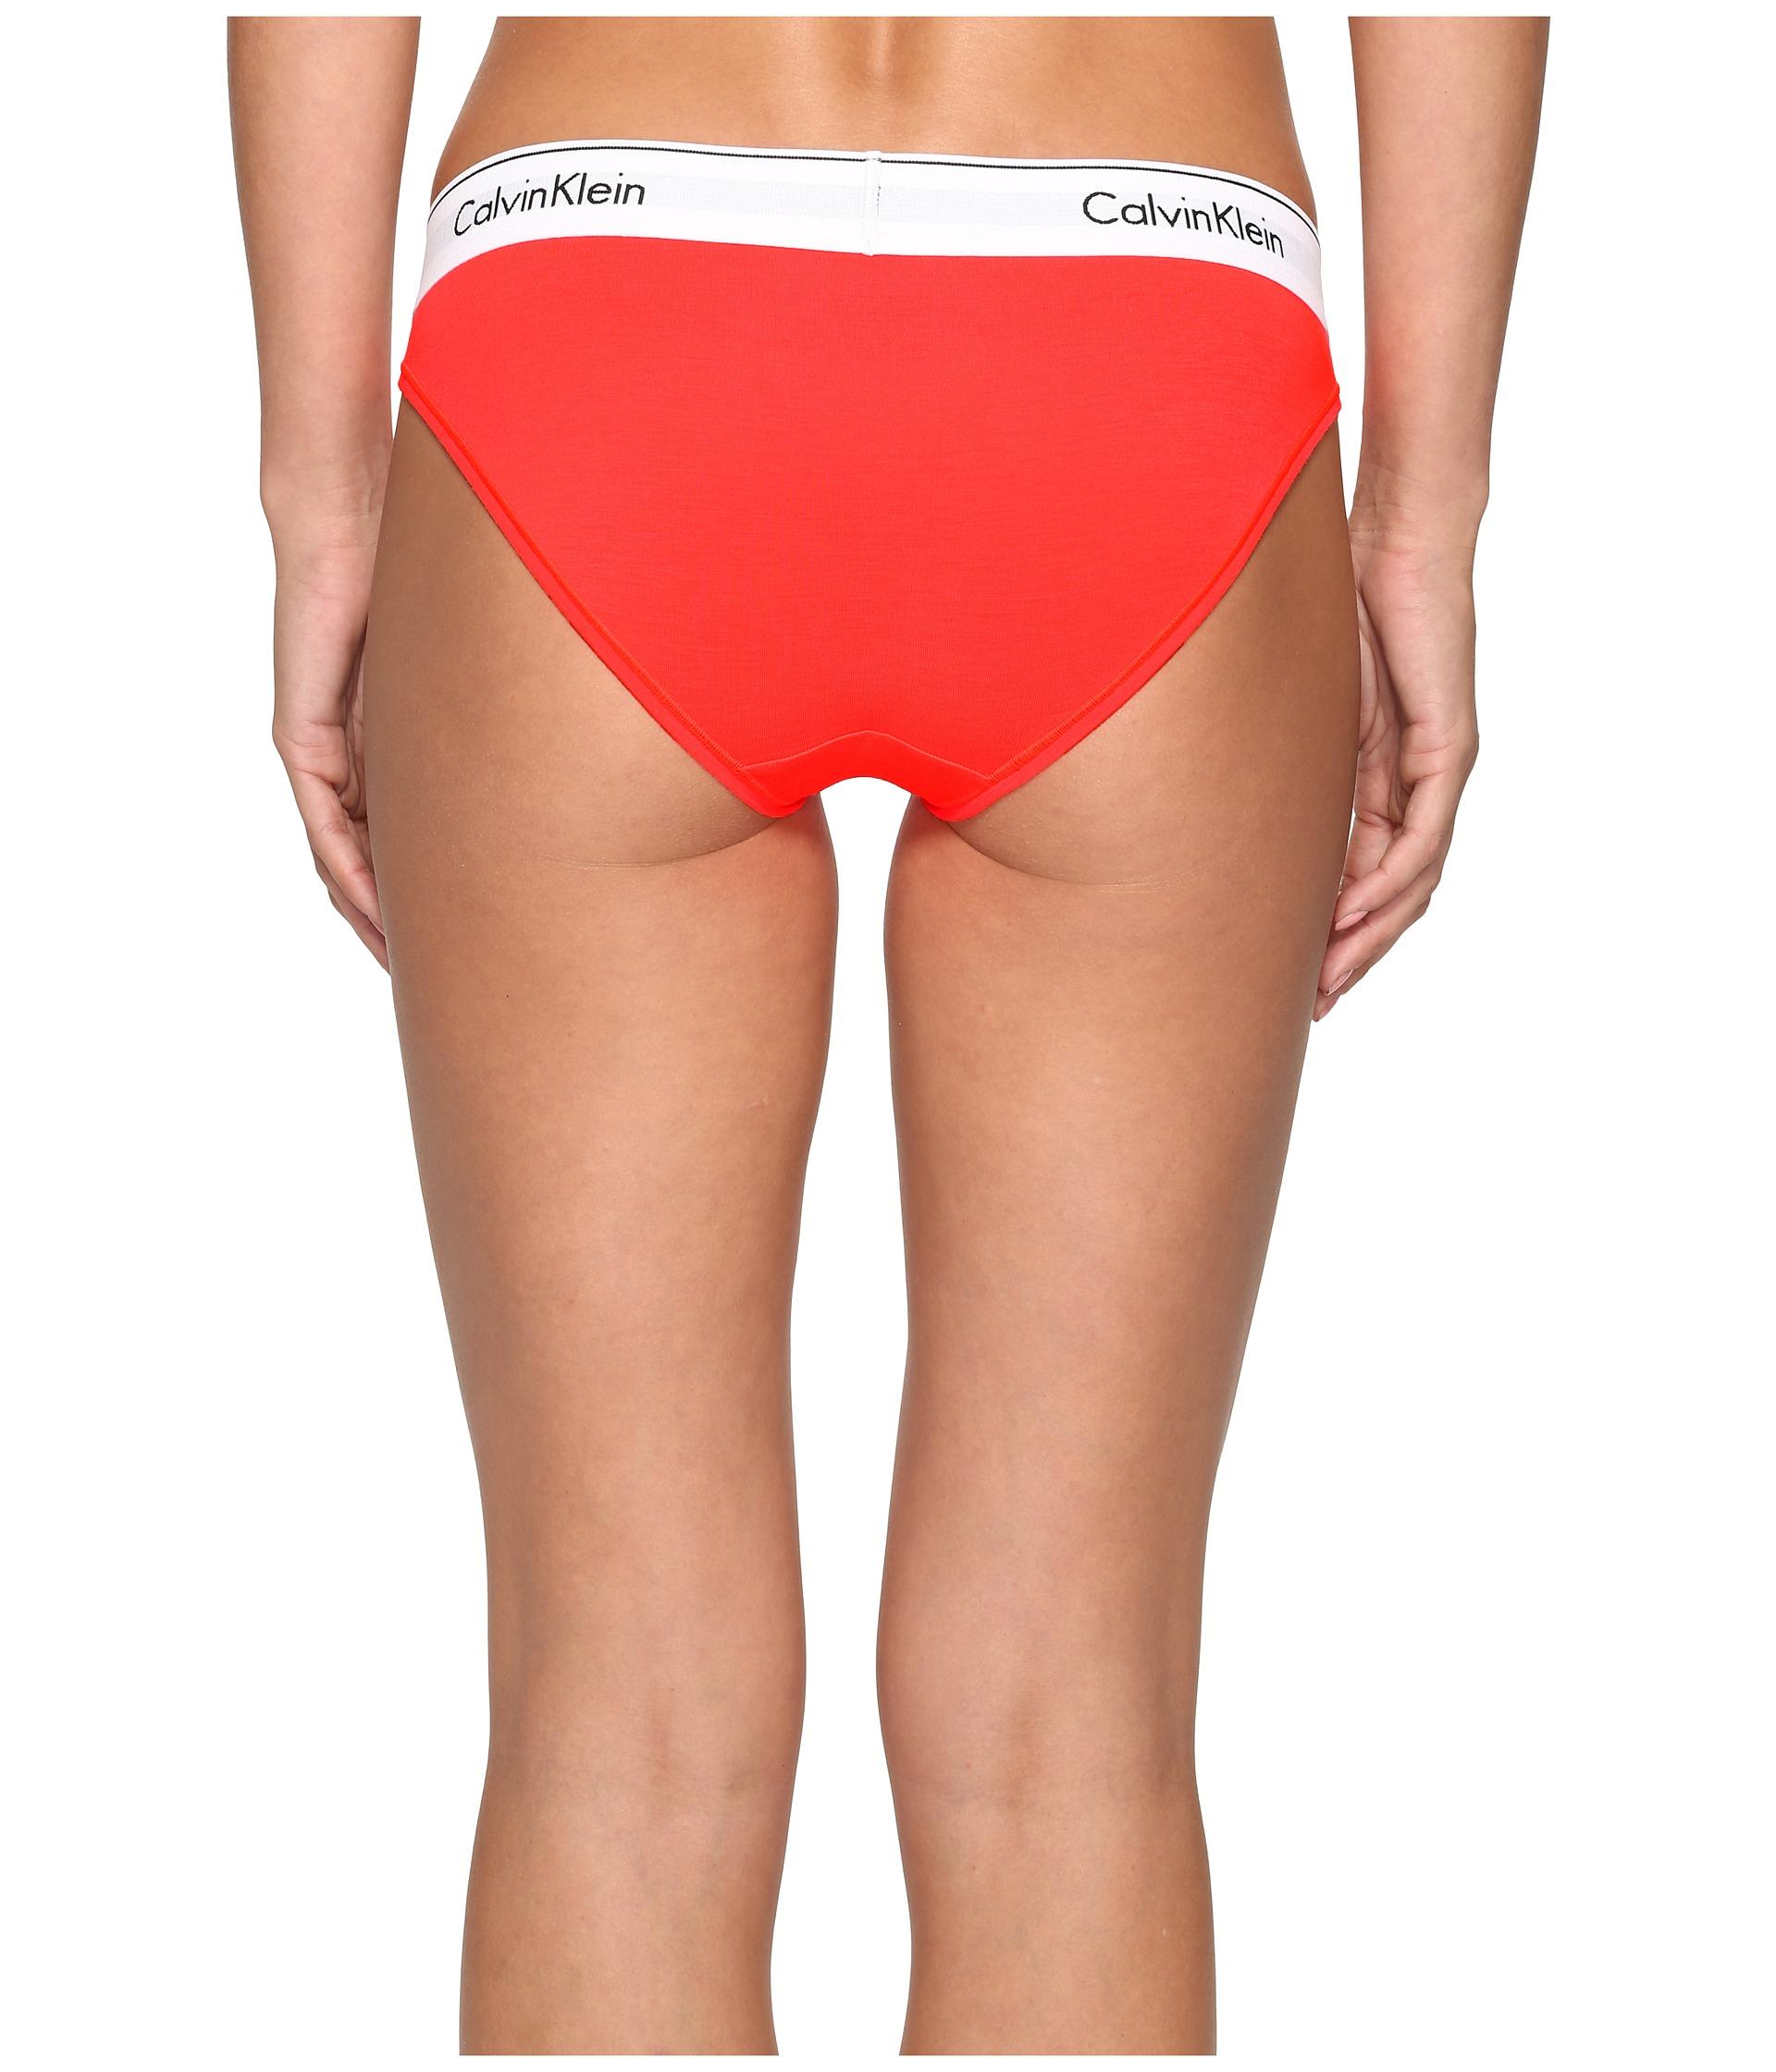 For calvin klein signature logo bikini sale love